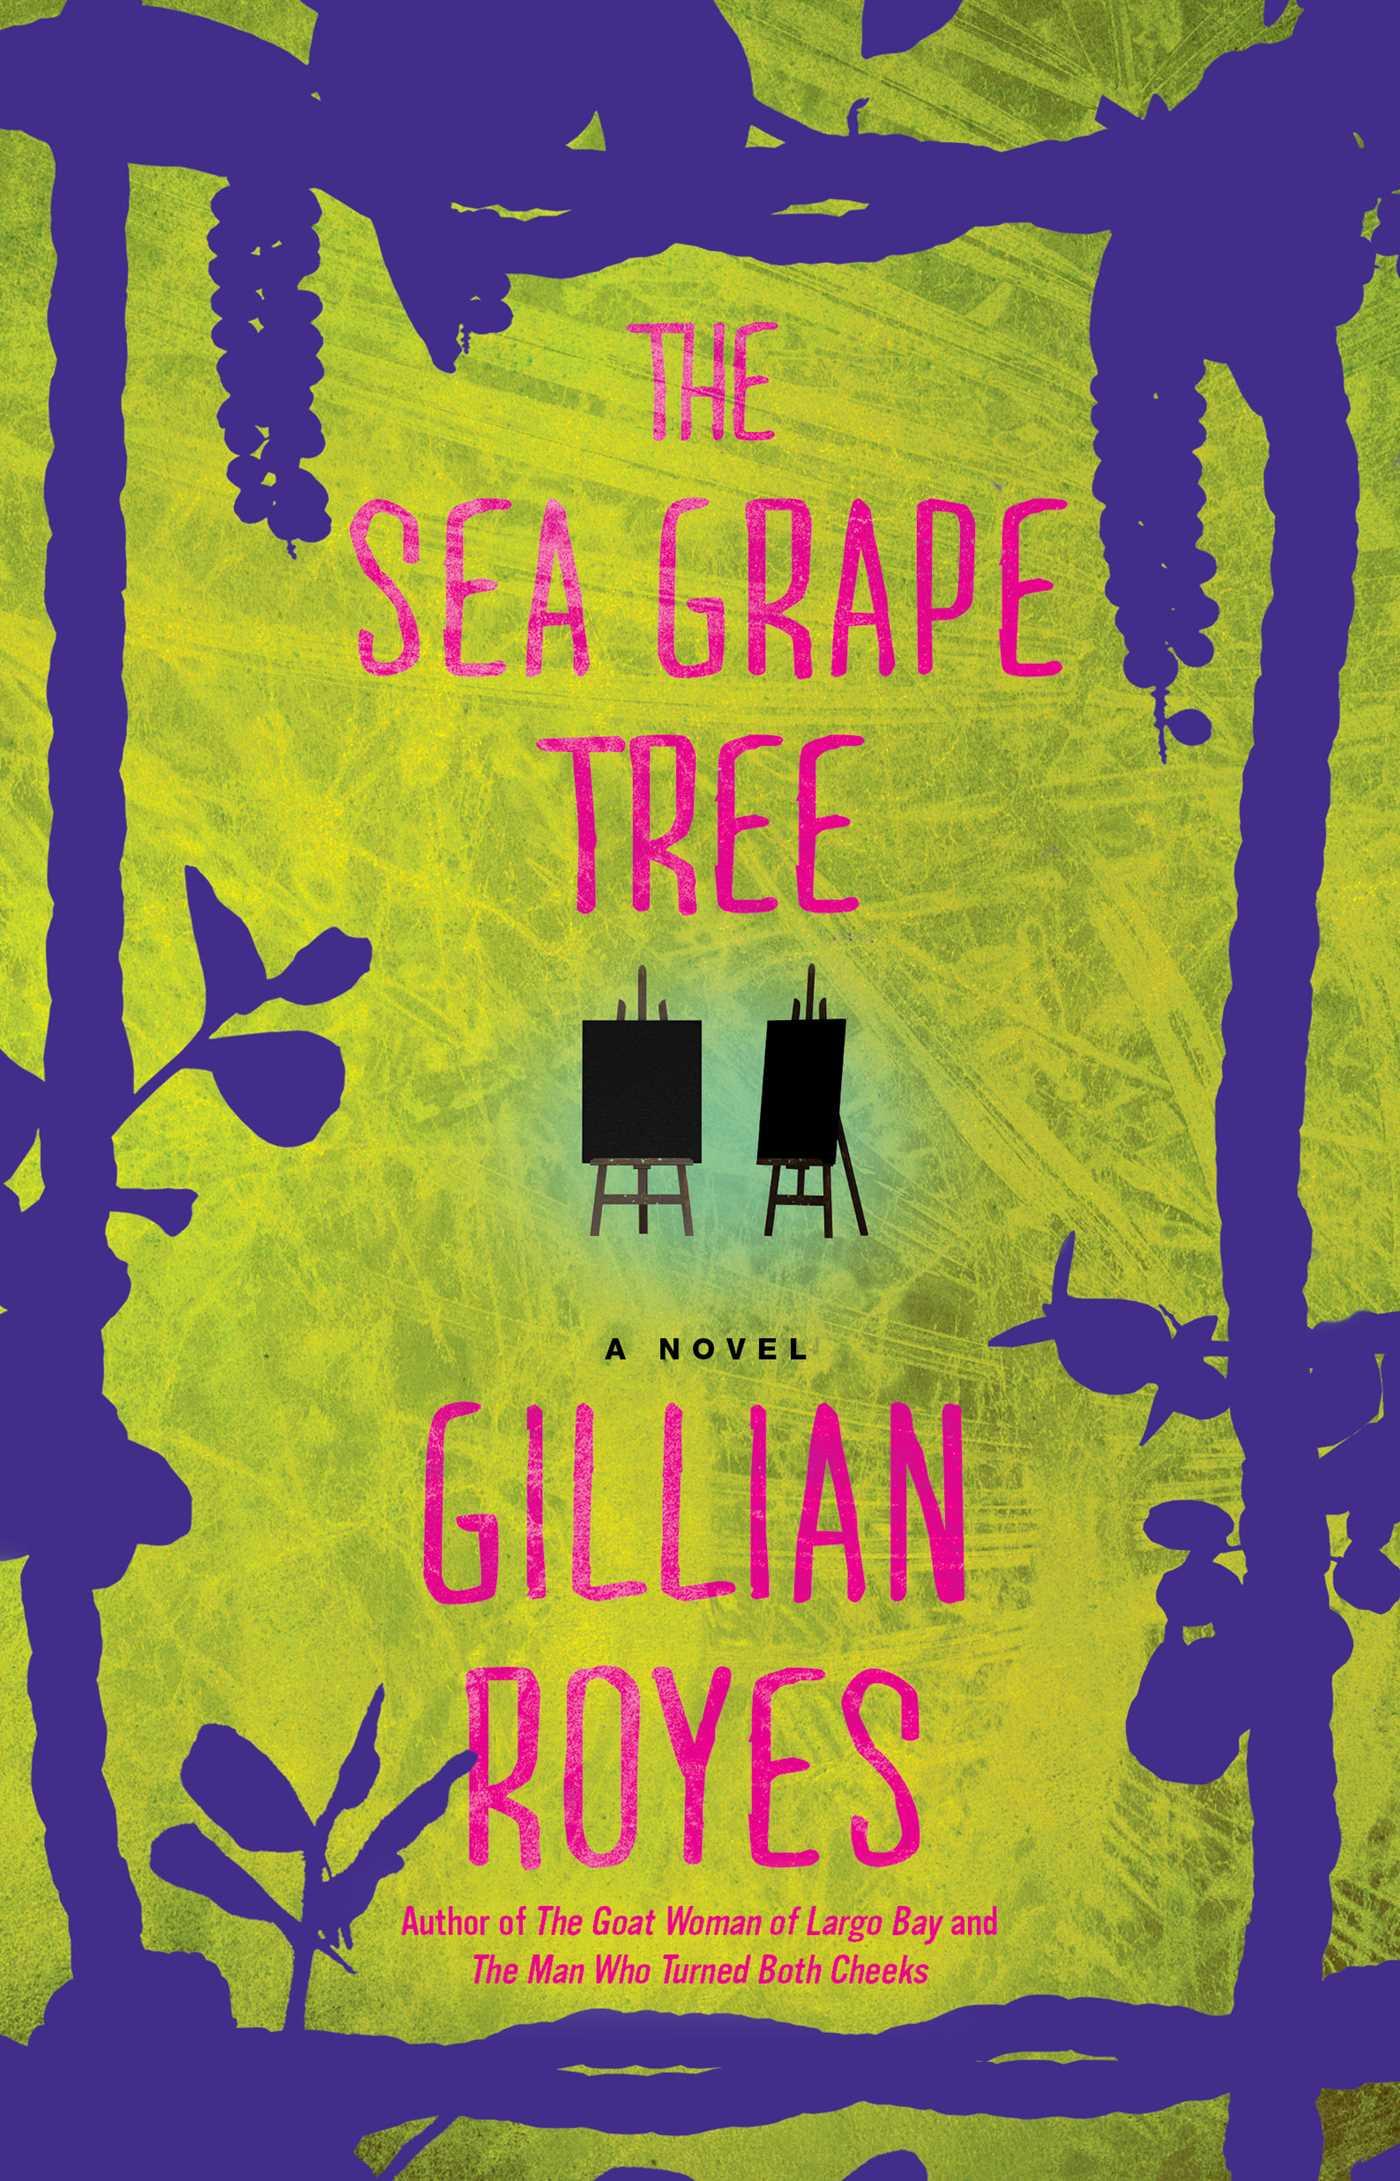 The sea grape tree 9781476762395 hr